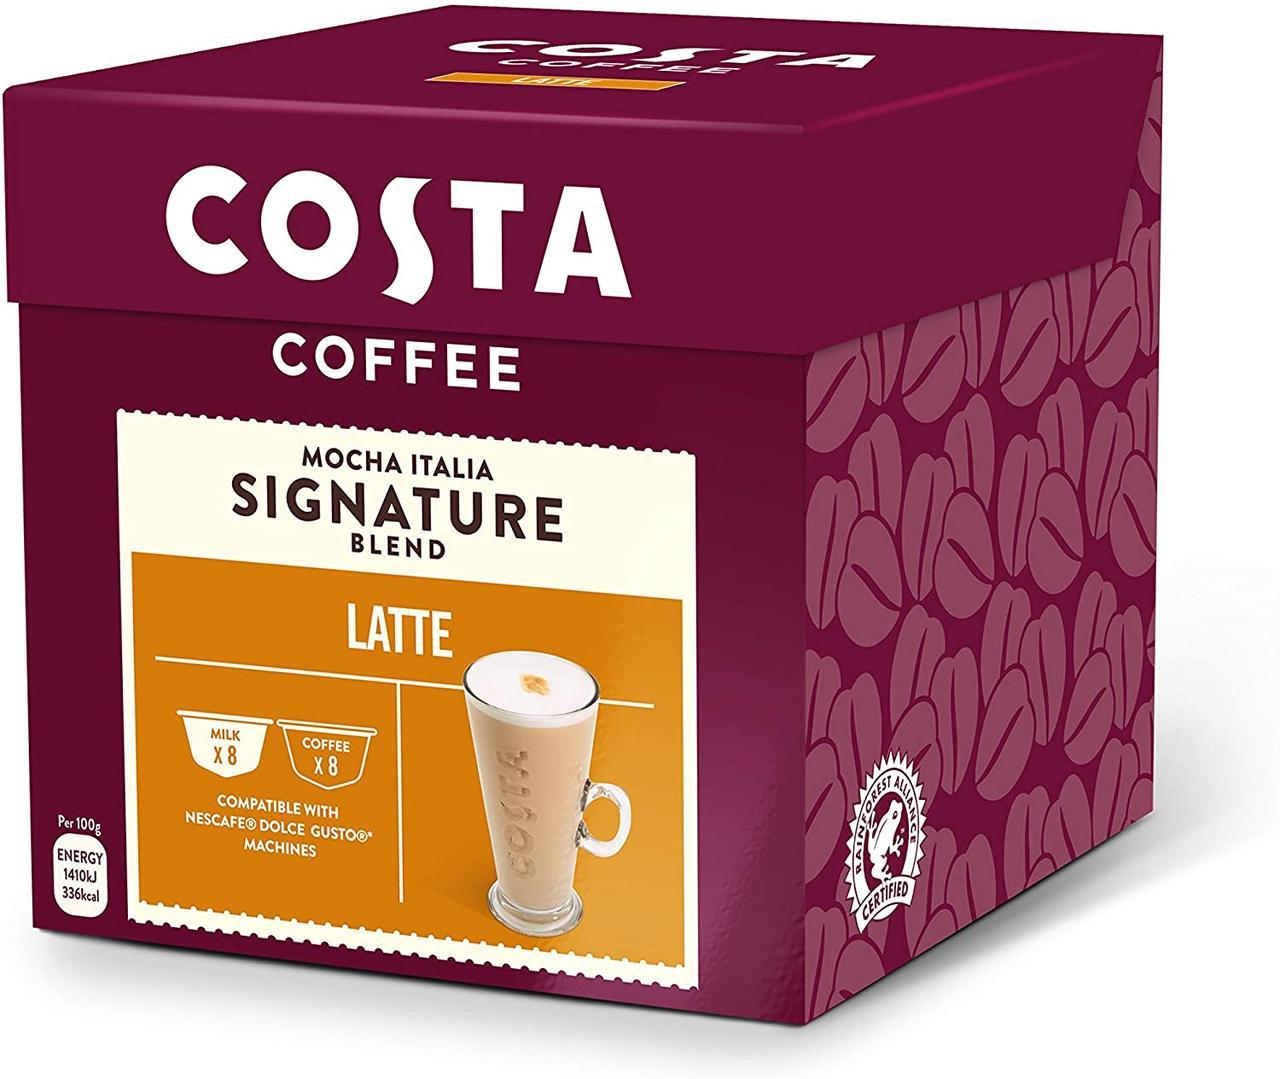 Dolce Gusto COSTA Latte  - Дольче густо КОСТА Латте   (16 капсул = 8 порций)